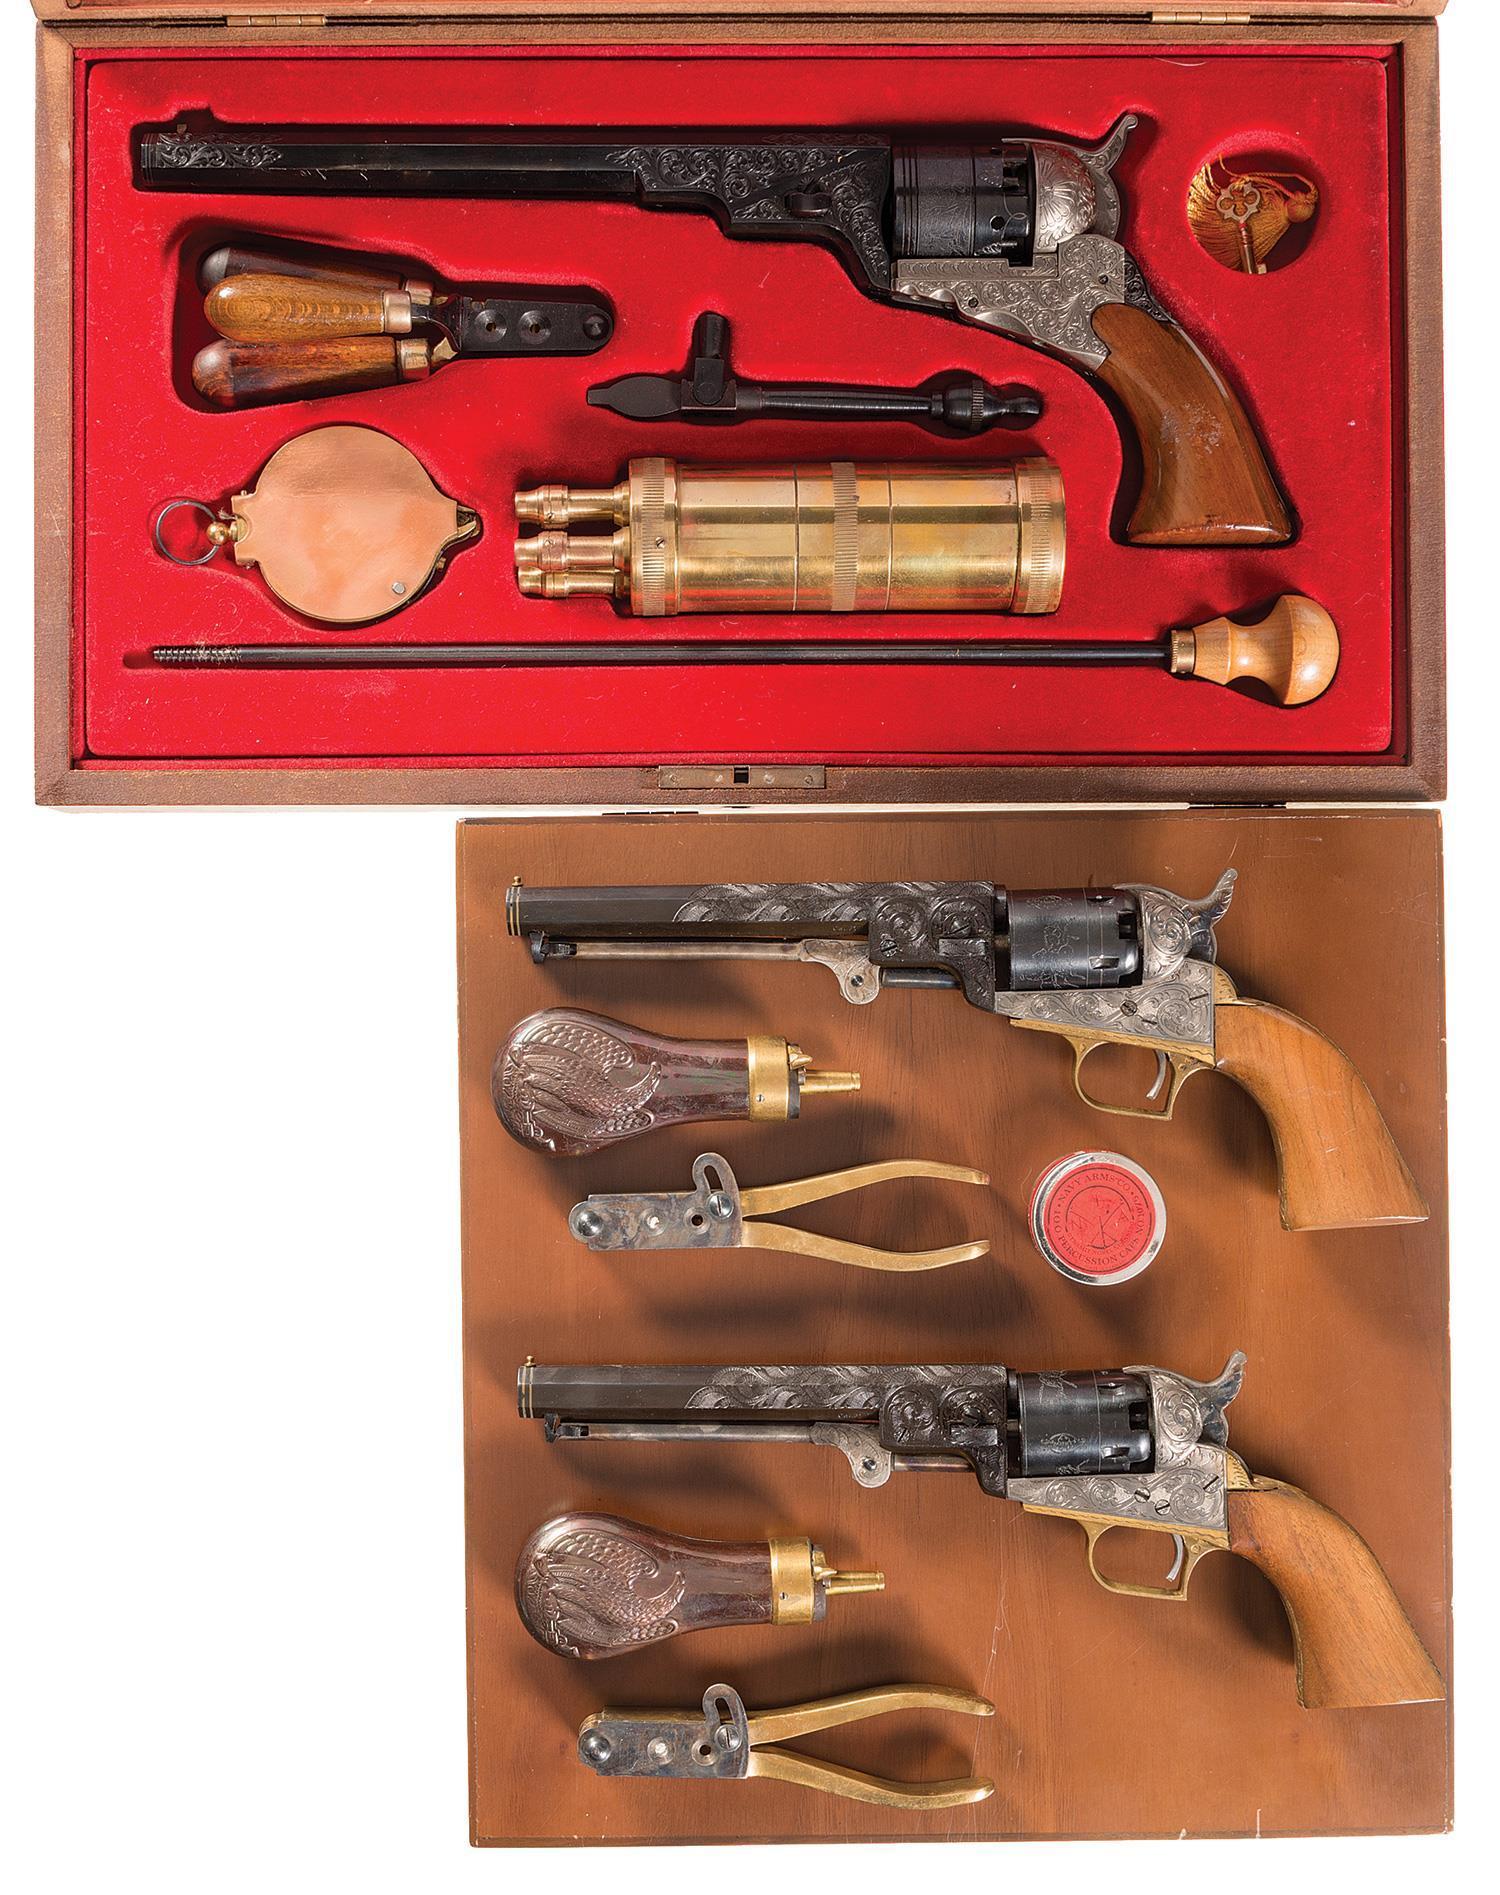 Repro Italian Antique Tarot Minchiate Cards 1 790: Reproduction-Revolver Firearms Auction Lot-1035